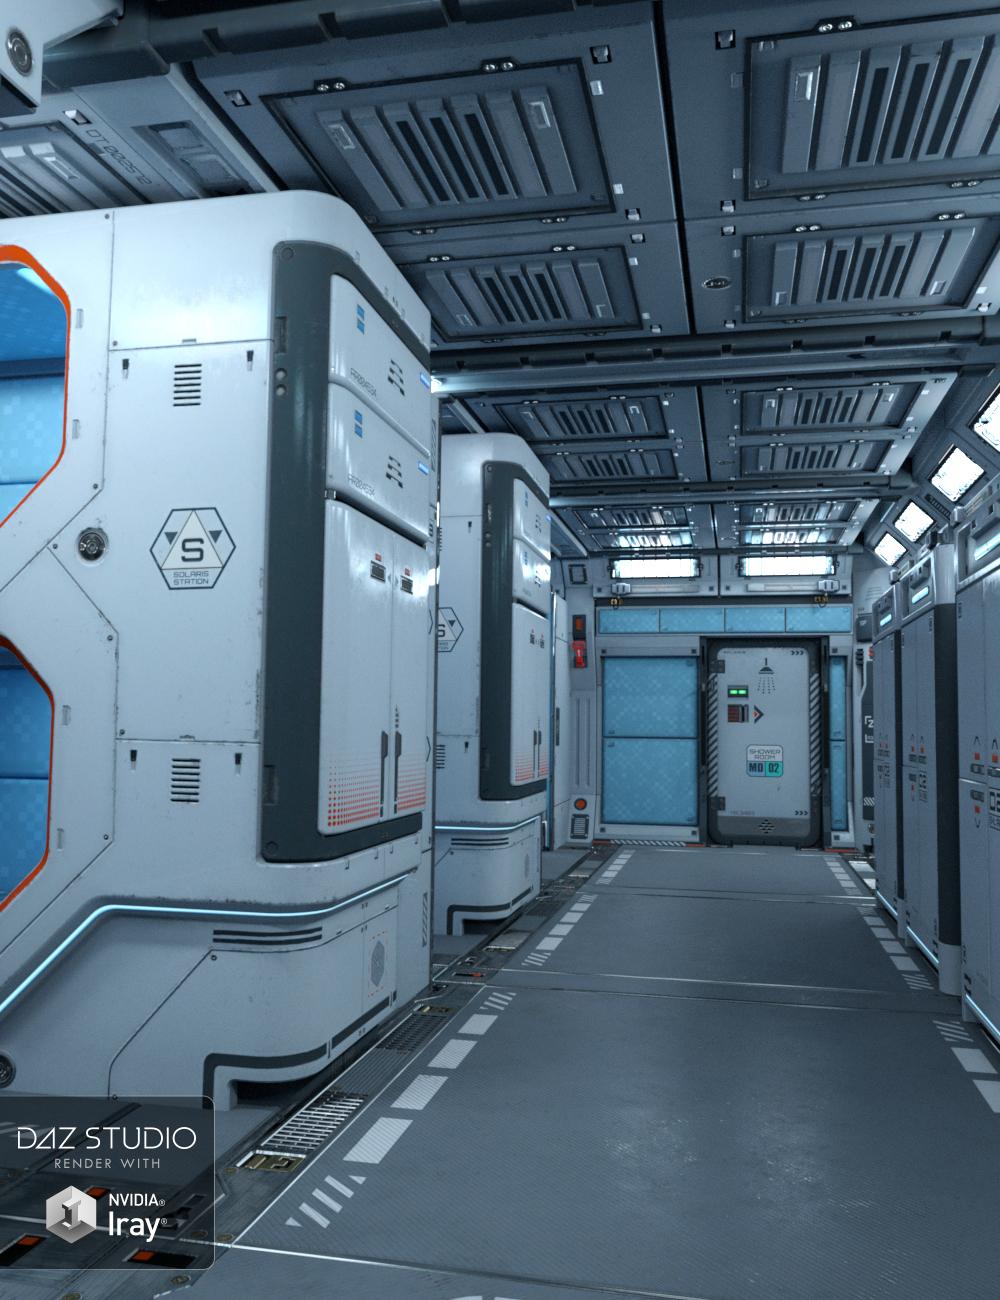 Solaris Cabin by: petipet, 3D Models by Daz 3D